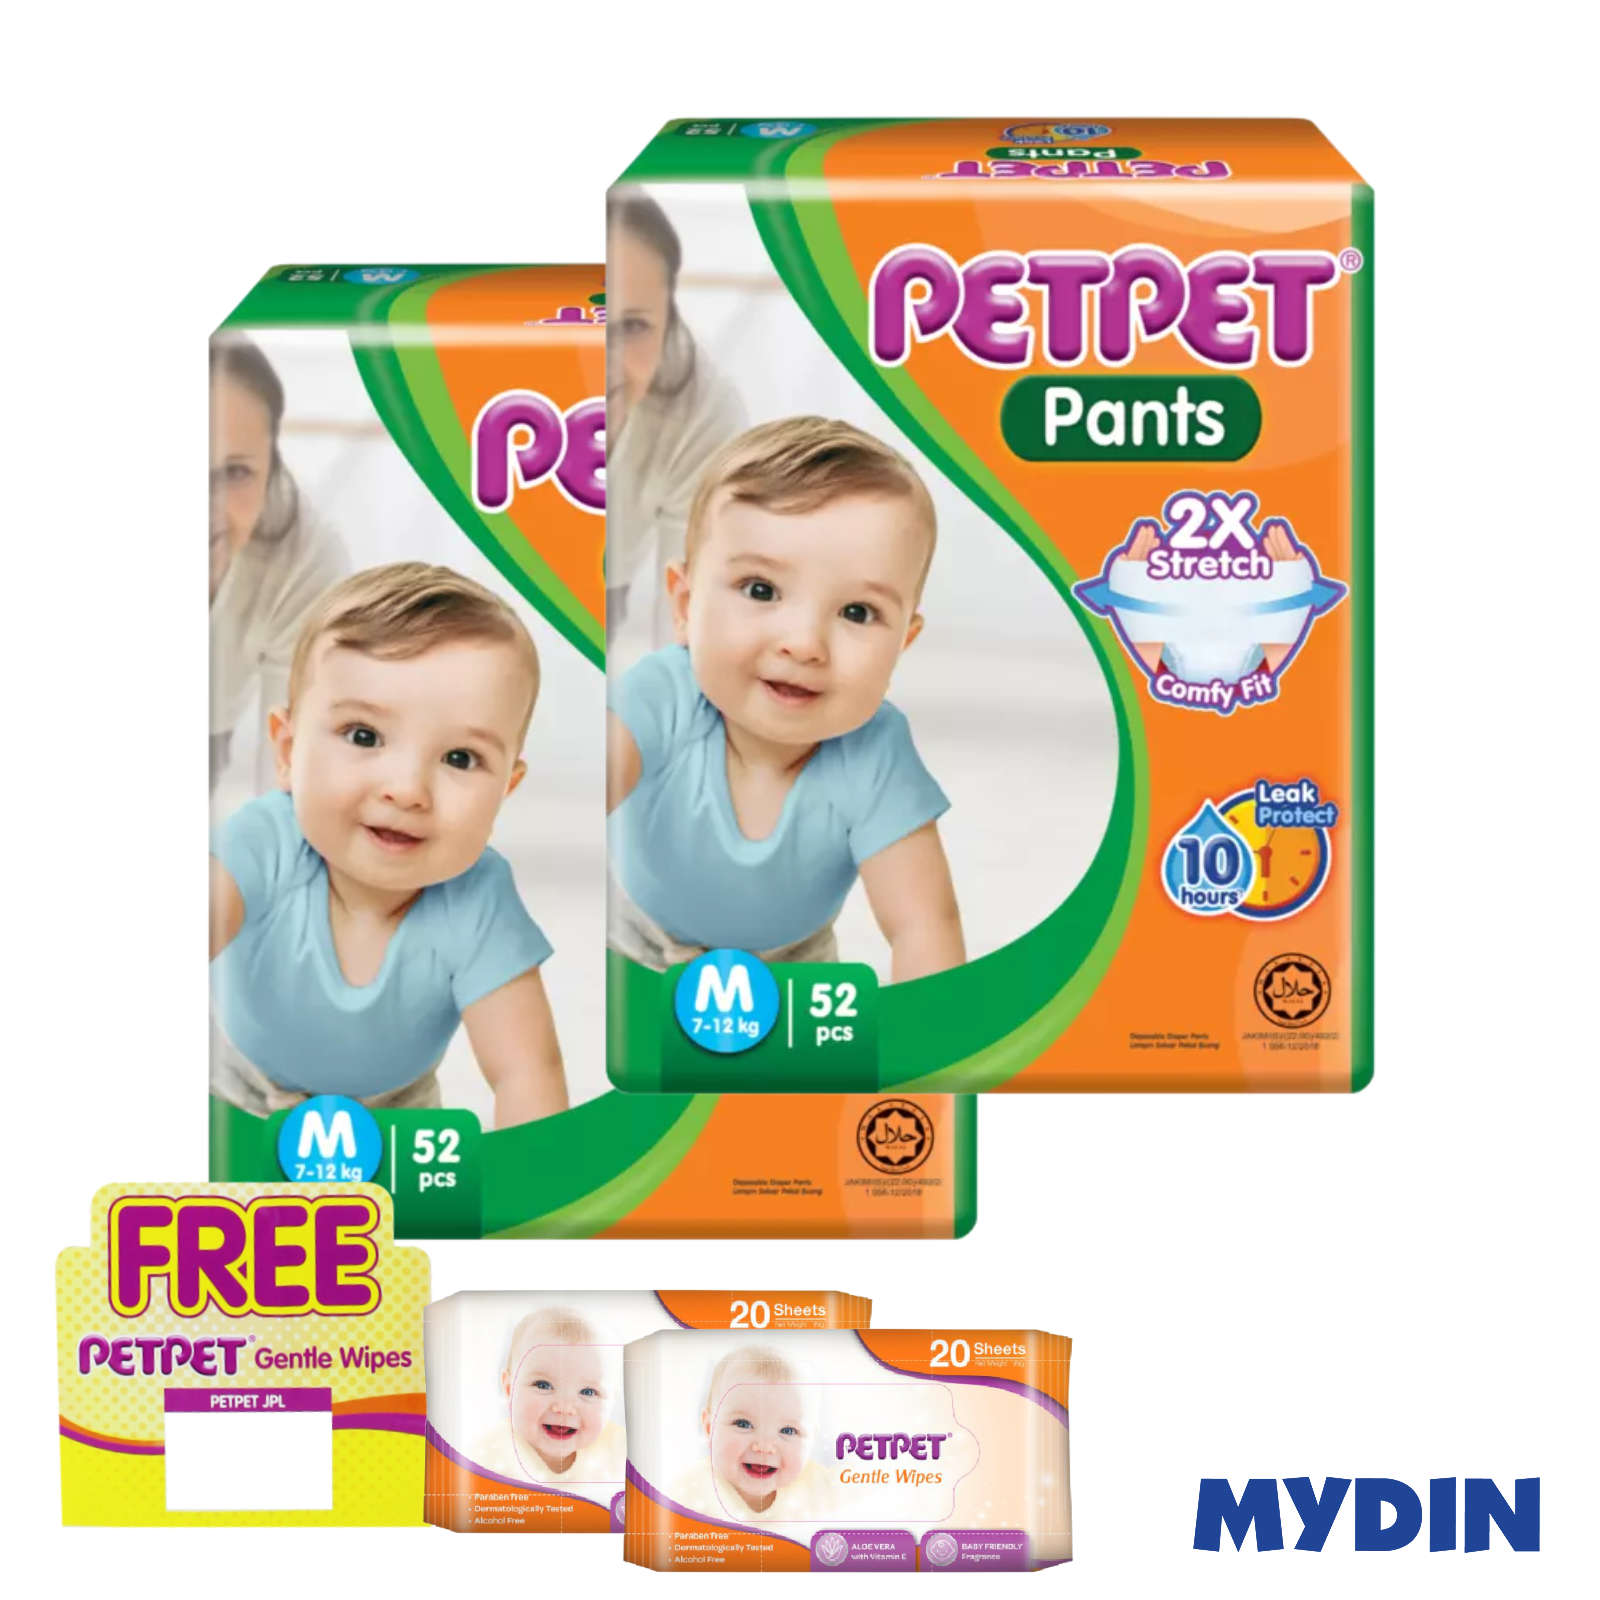 PetPet Pants Jumbo Twinpack M (52pcs x 2) FOC Gentle Wipes (While Stock Last)